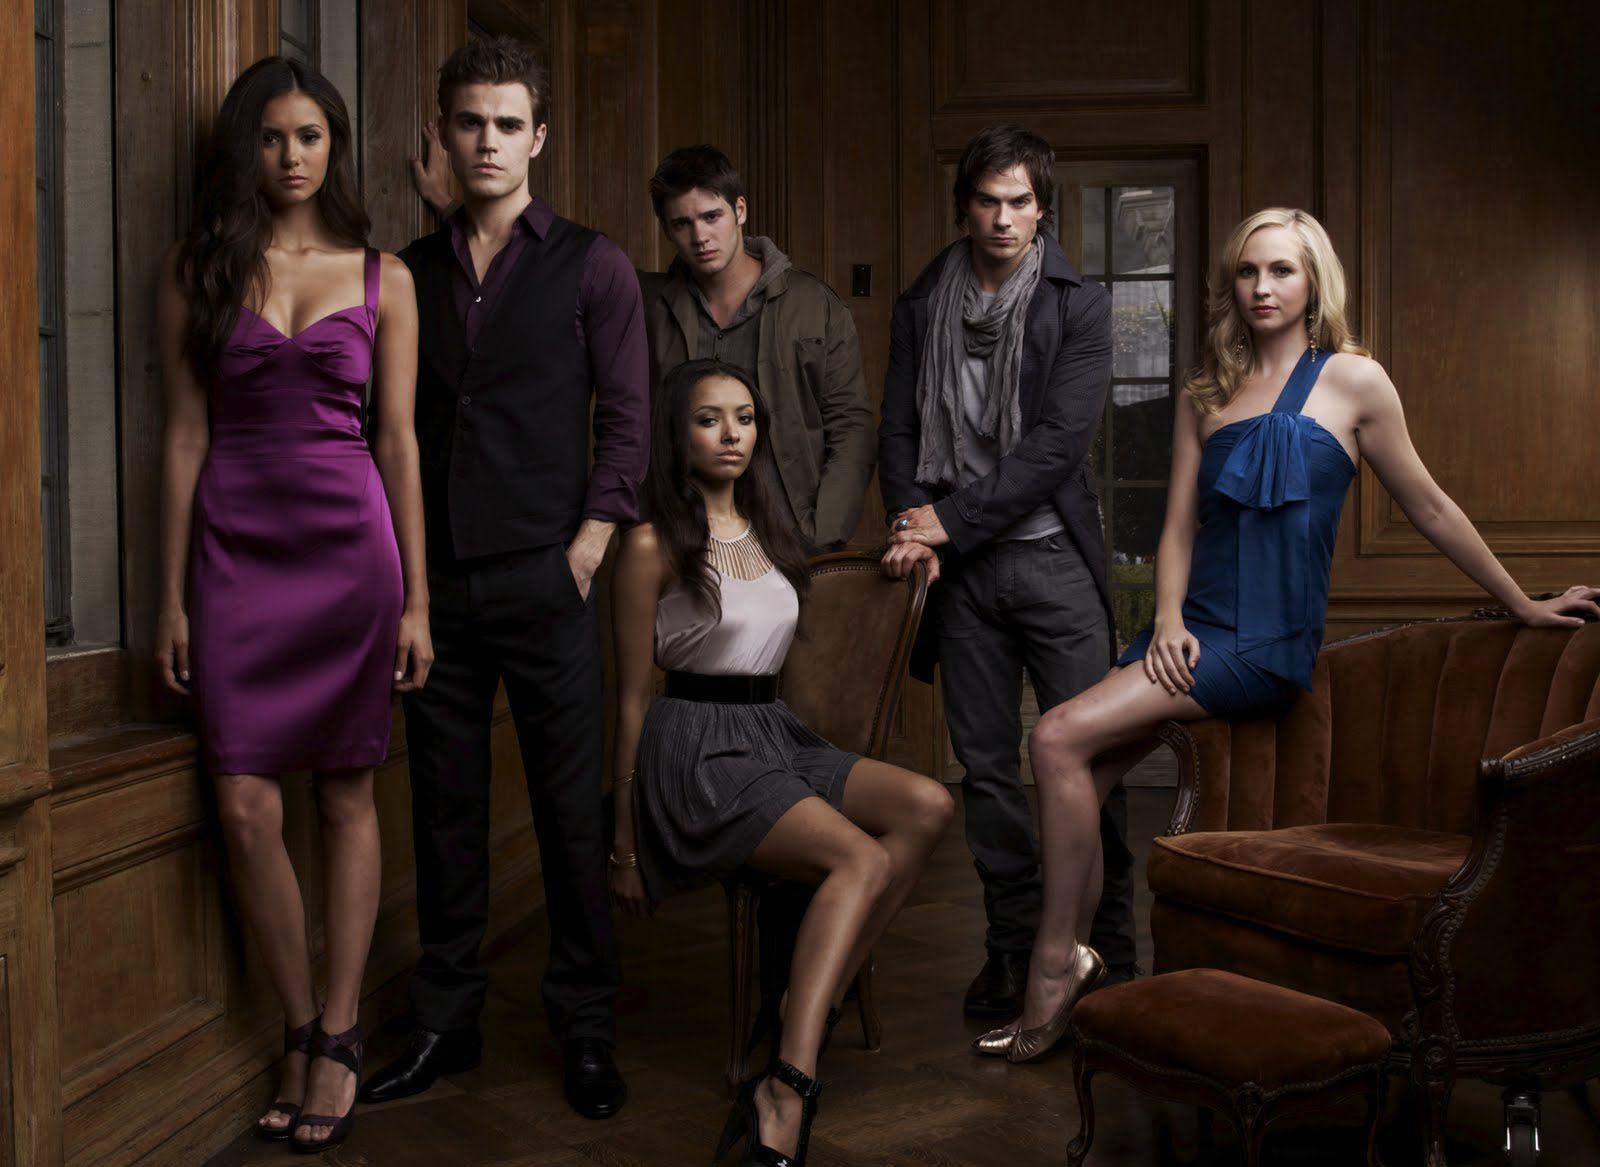 Vampire Diaries Serie Ian Somerhalder Damon Salvatore Nina Dobrev Elena Gilbert Katherine Pierce